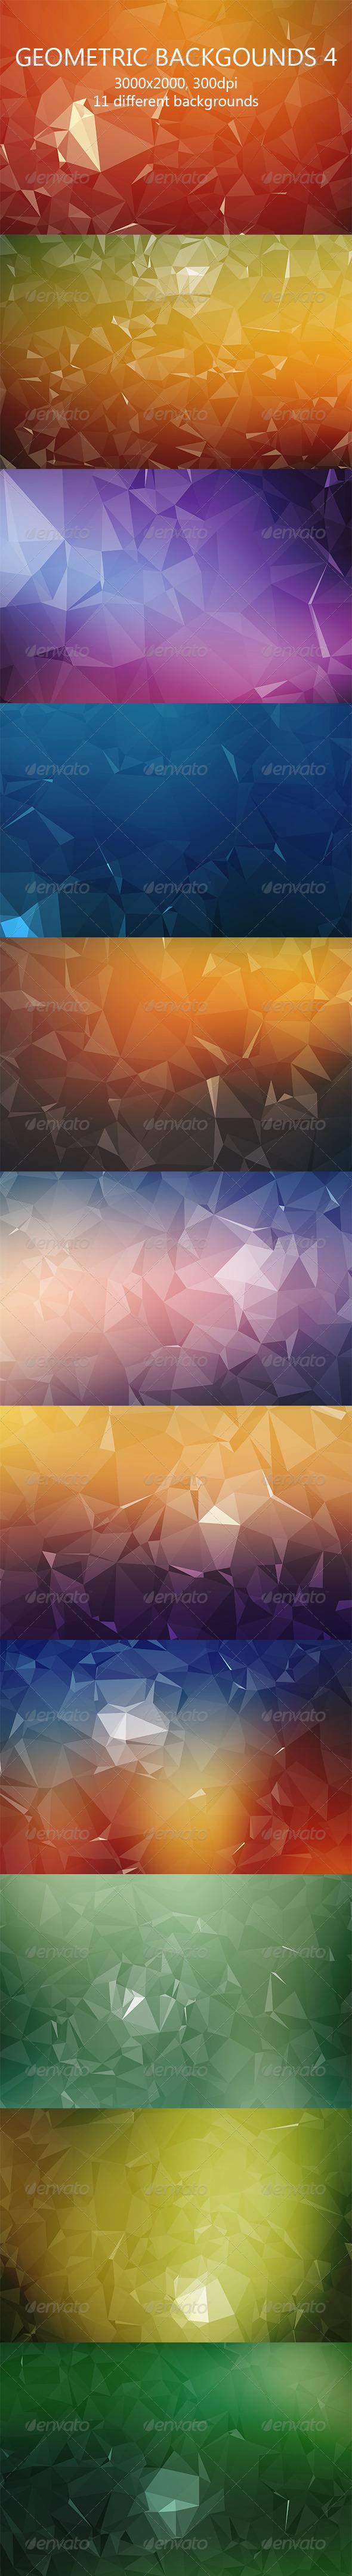 Geometric Backgrounds 4